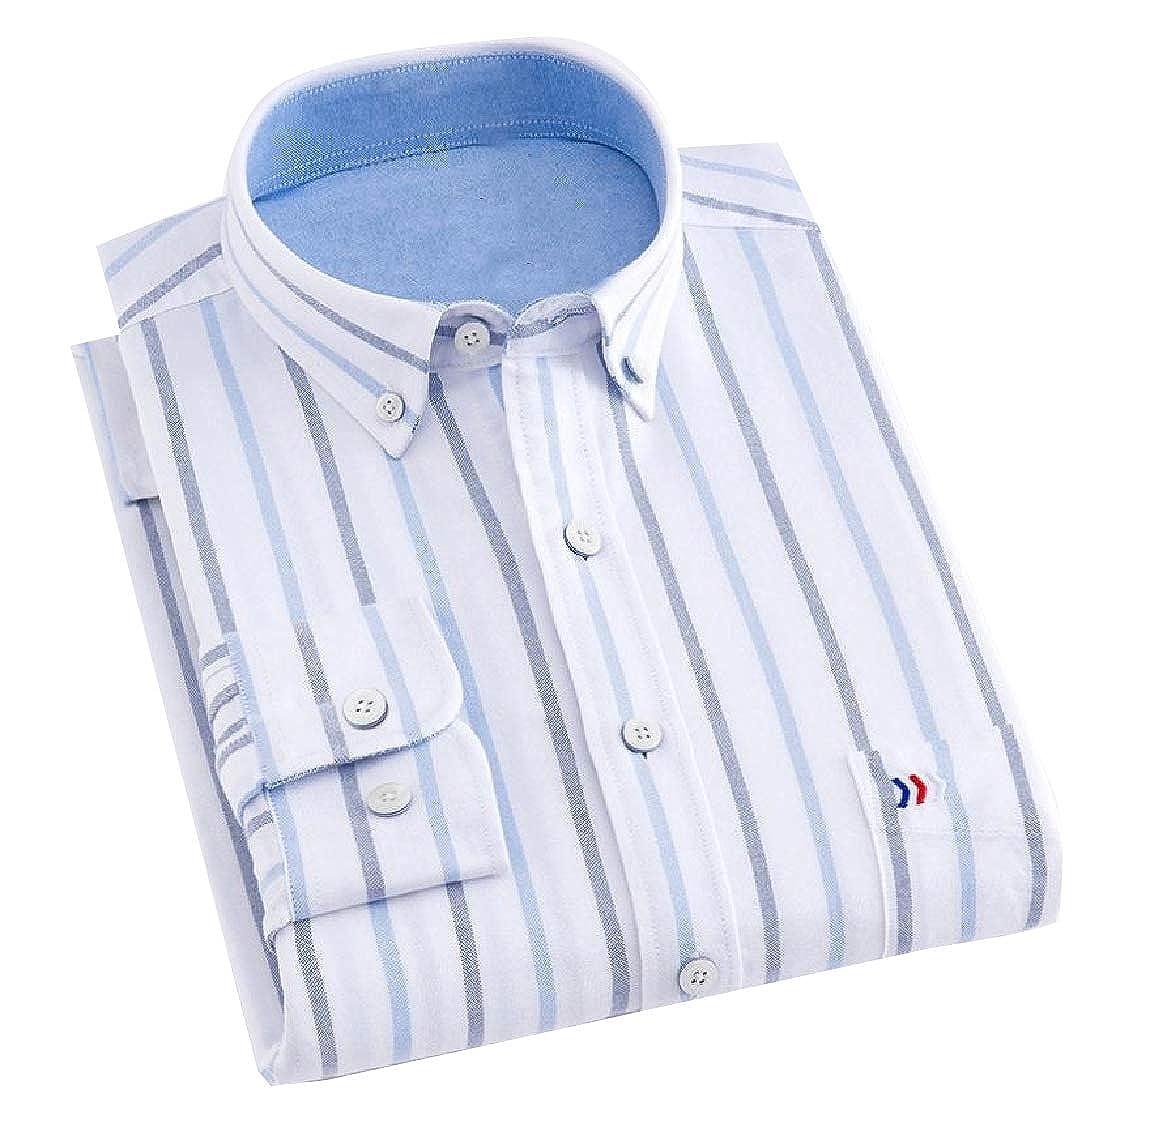 YUNY Mens Long-Sleeve Plaid Cozy Formal Classic Oxford Poplin Shirt 30 XL